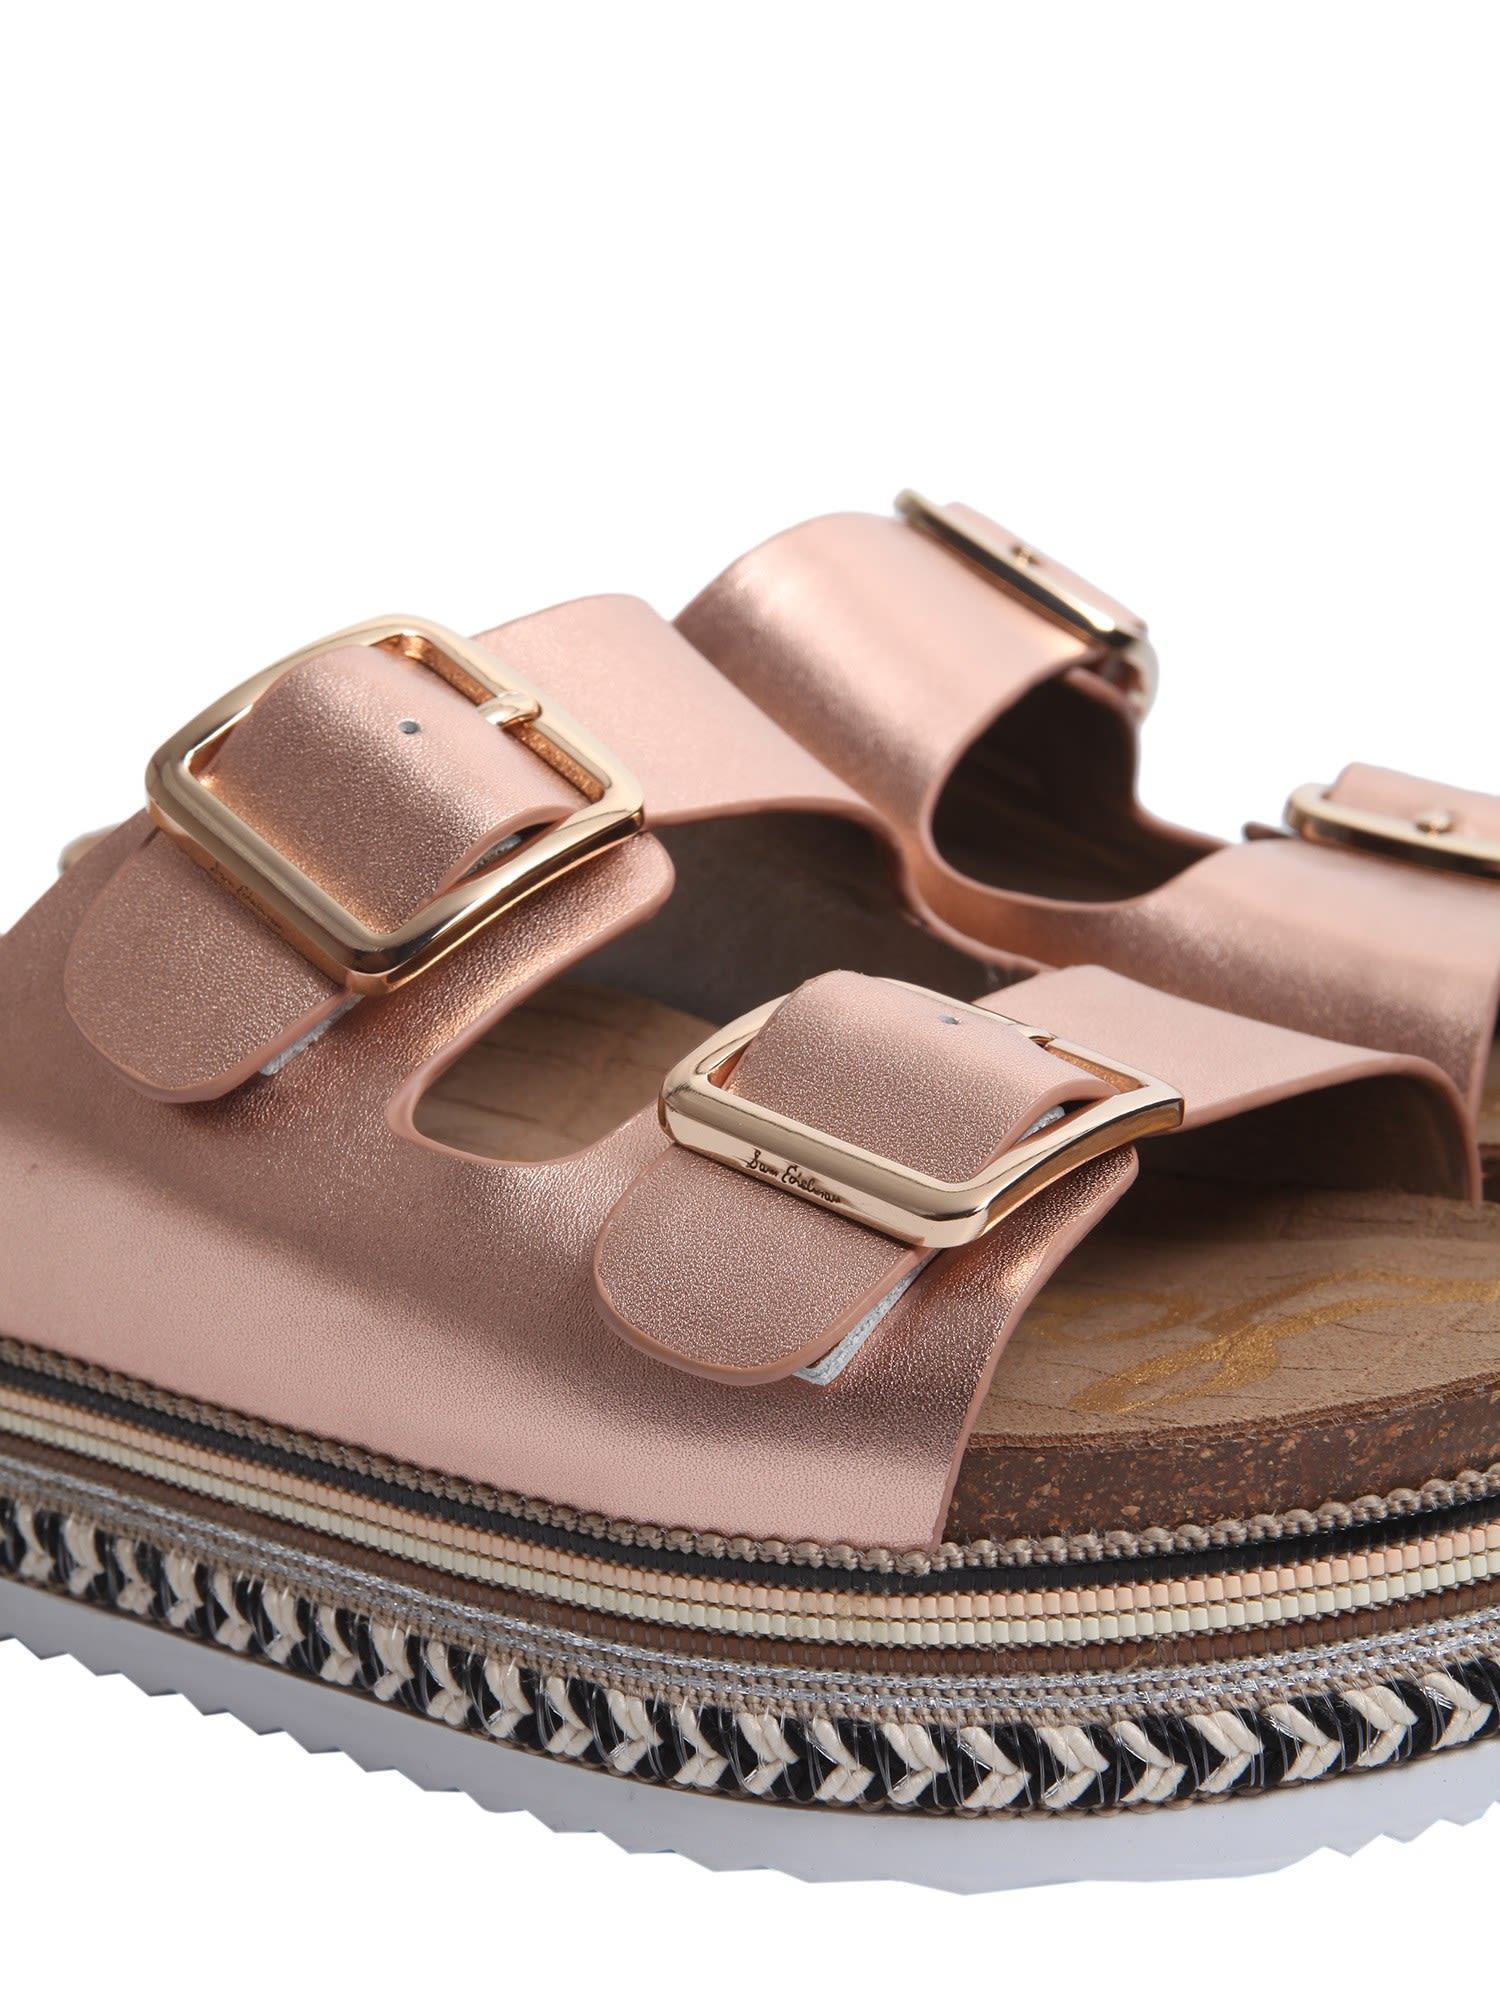 dded17634 Sam Edelman Sam Edelman Oakley Slide Sandals - Pink - 10589148